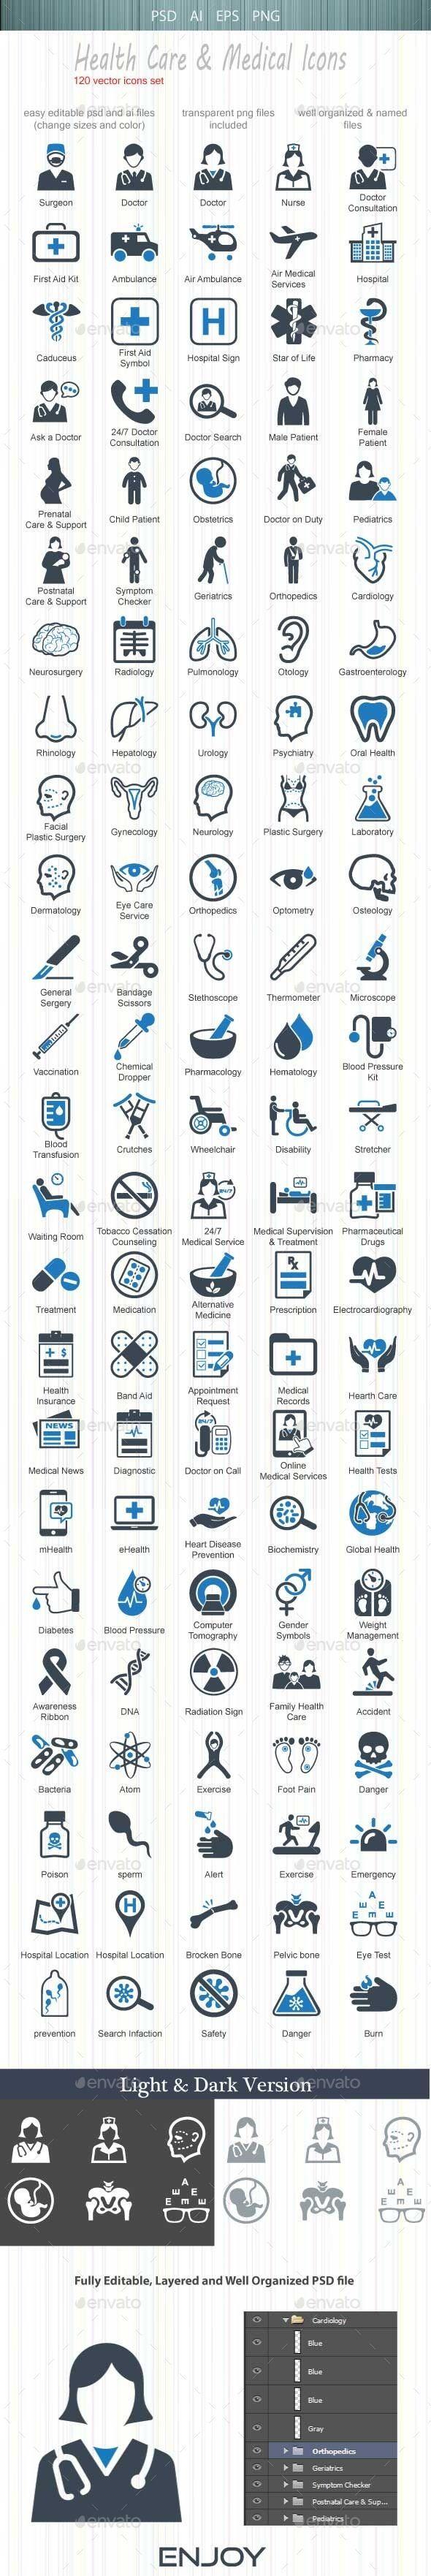 Health Care & Medical Icons #design Buy Now: http://graphicriver.net/item/health-care-medical-icons/12853833?ref=ksioks